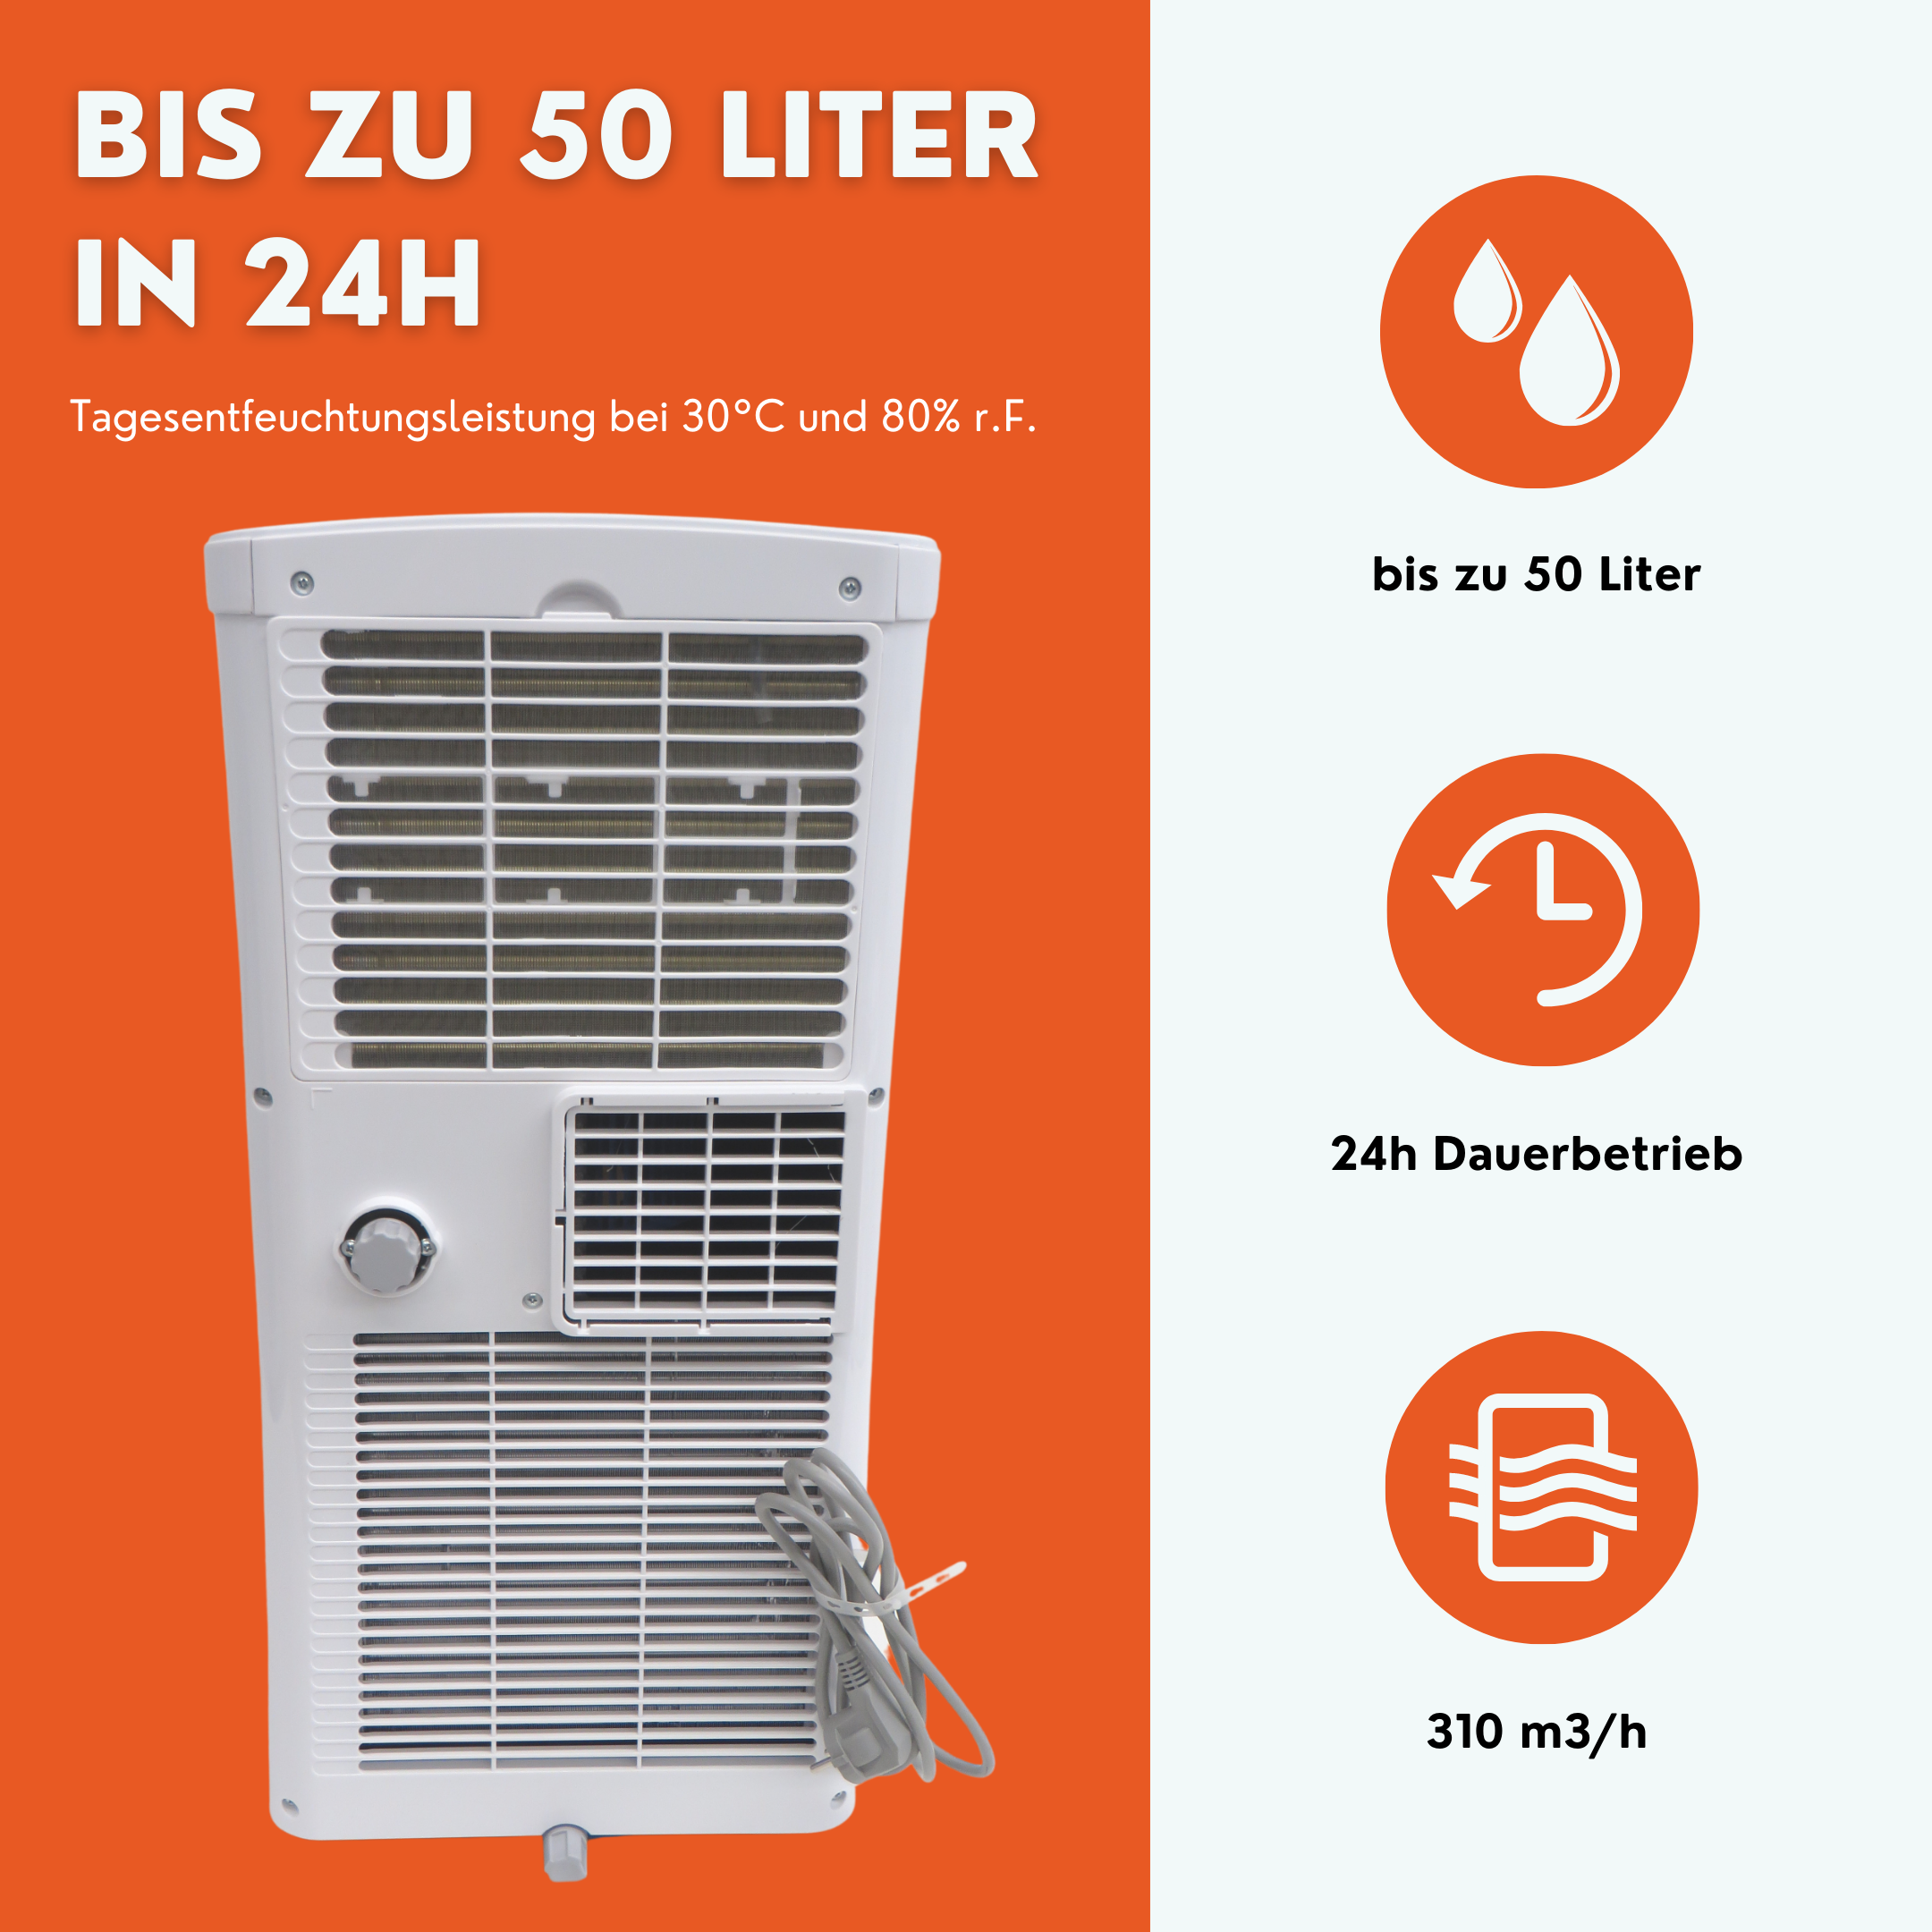 Climia CMK mobiler Bautrockner ca. 50 Liter in 24h, Ventilator und Luftentfeuchter EEK: A